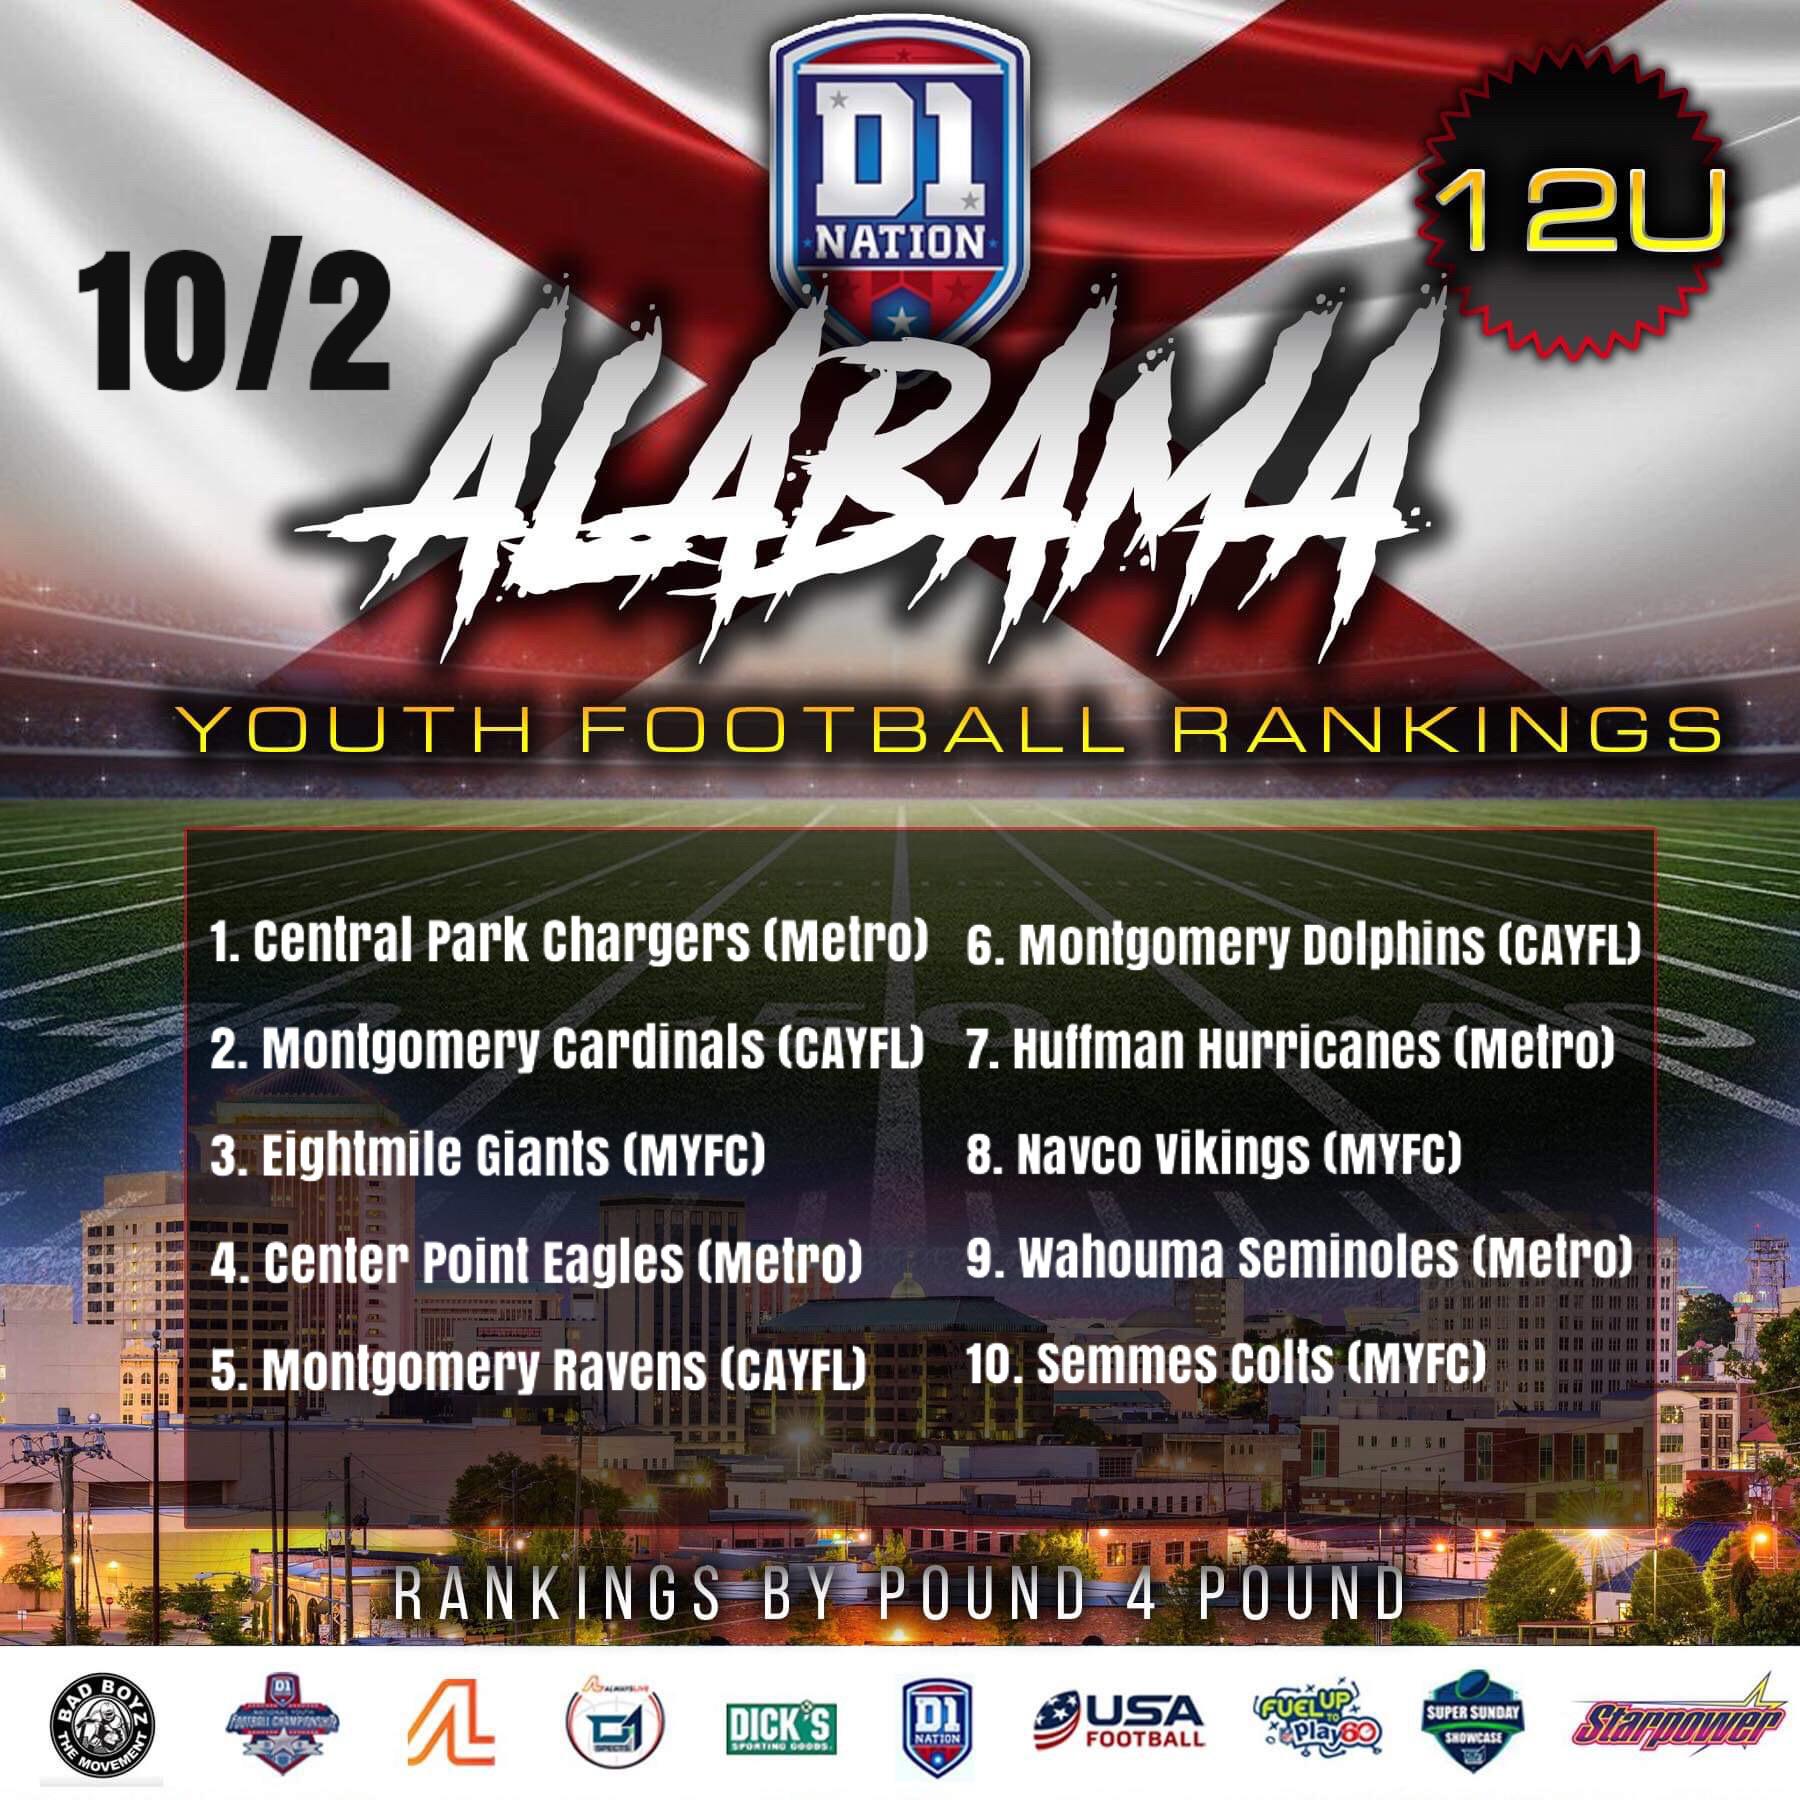 UPDATE 10/2/2019: Alabama Youth Football Rankings – 12U